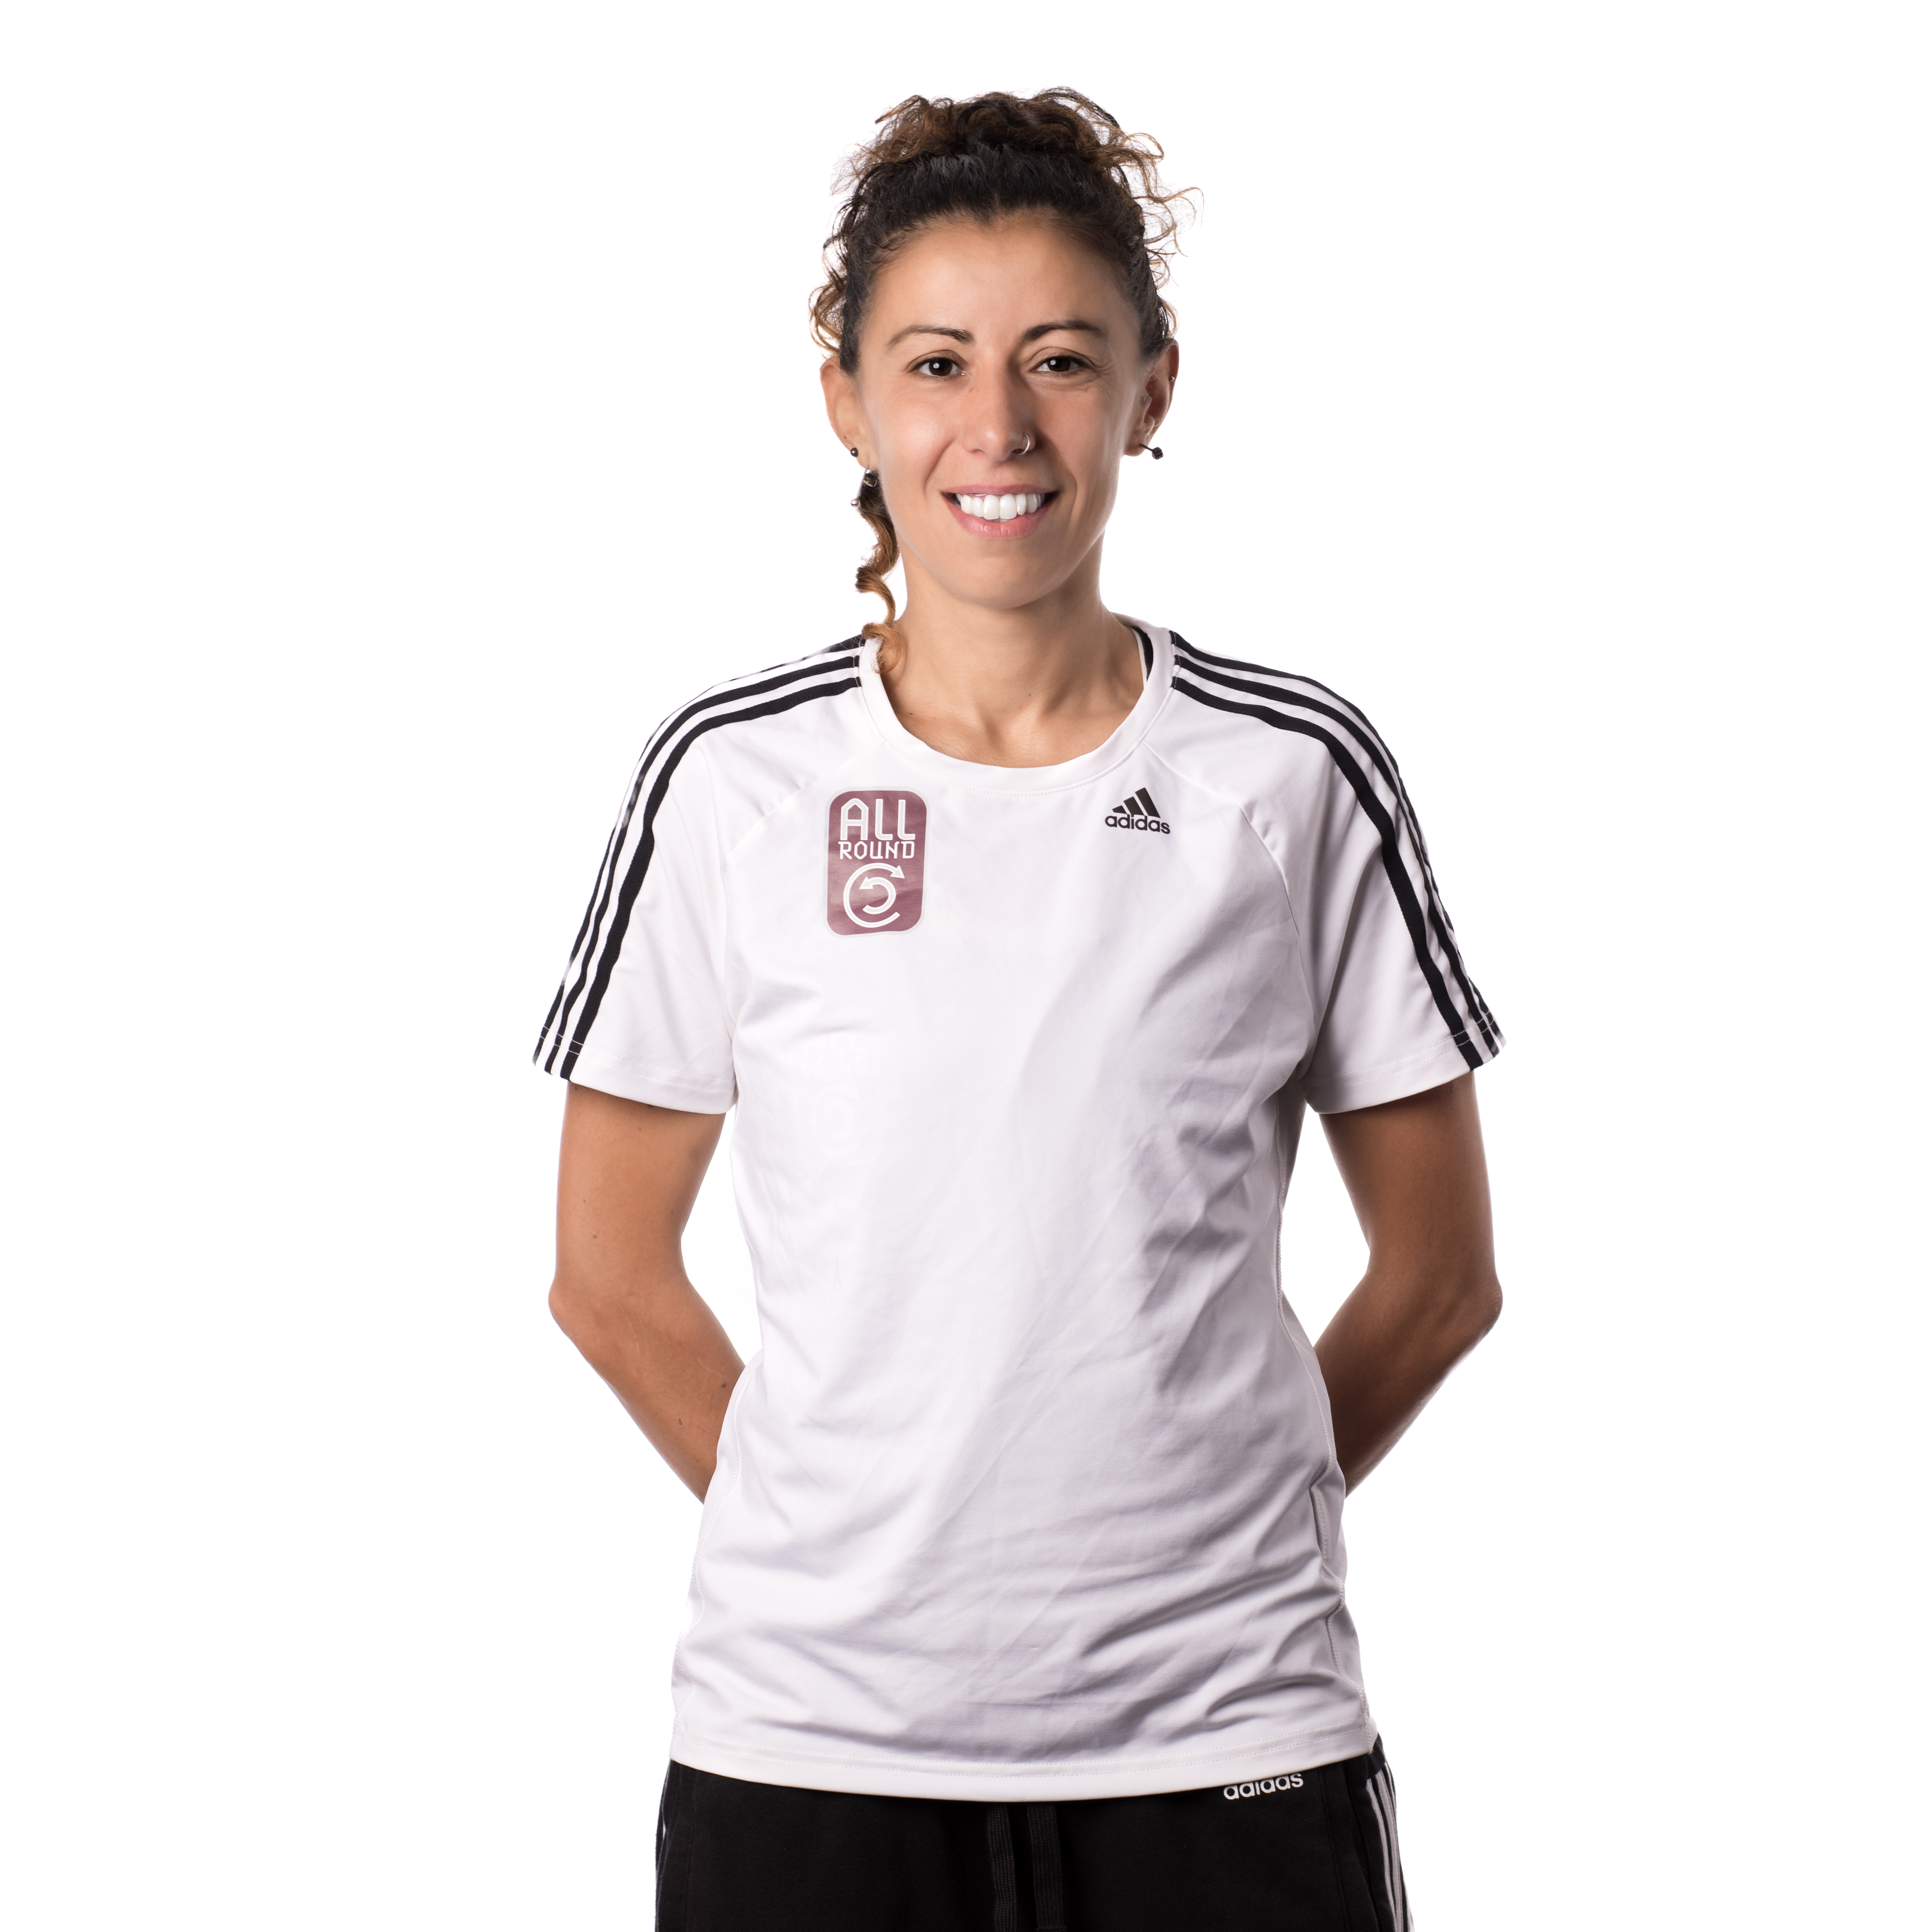 Laura Garipoli